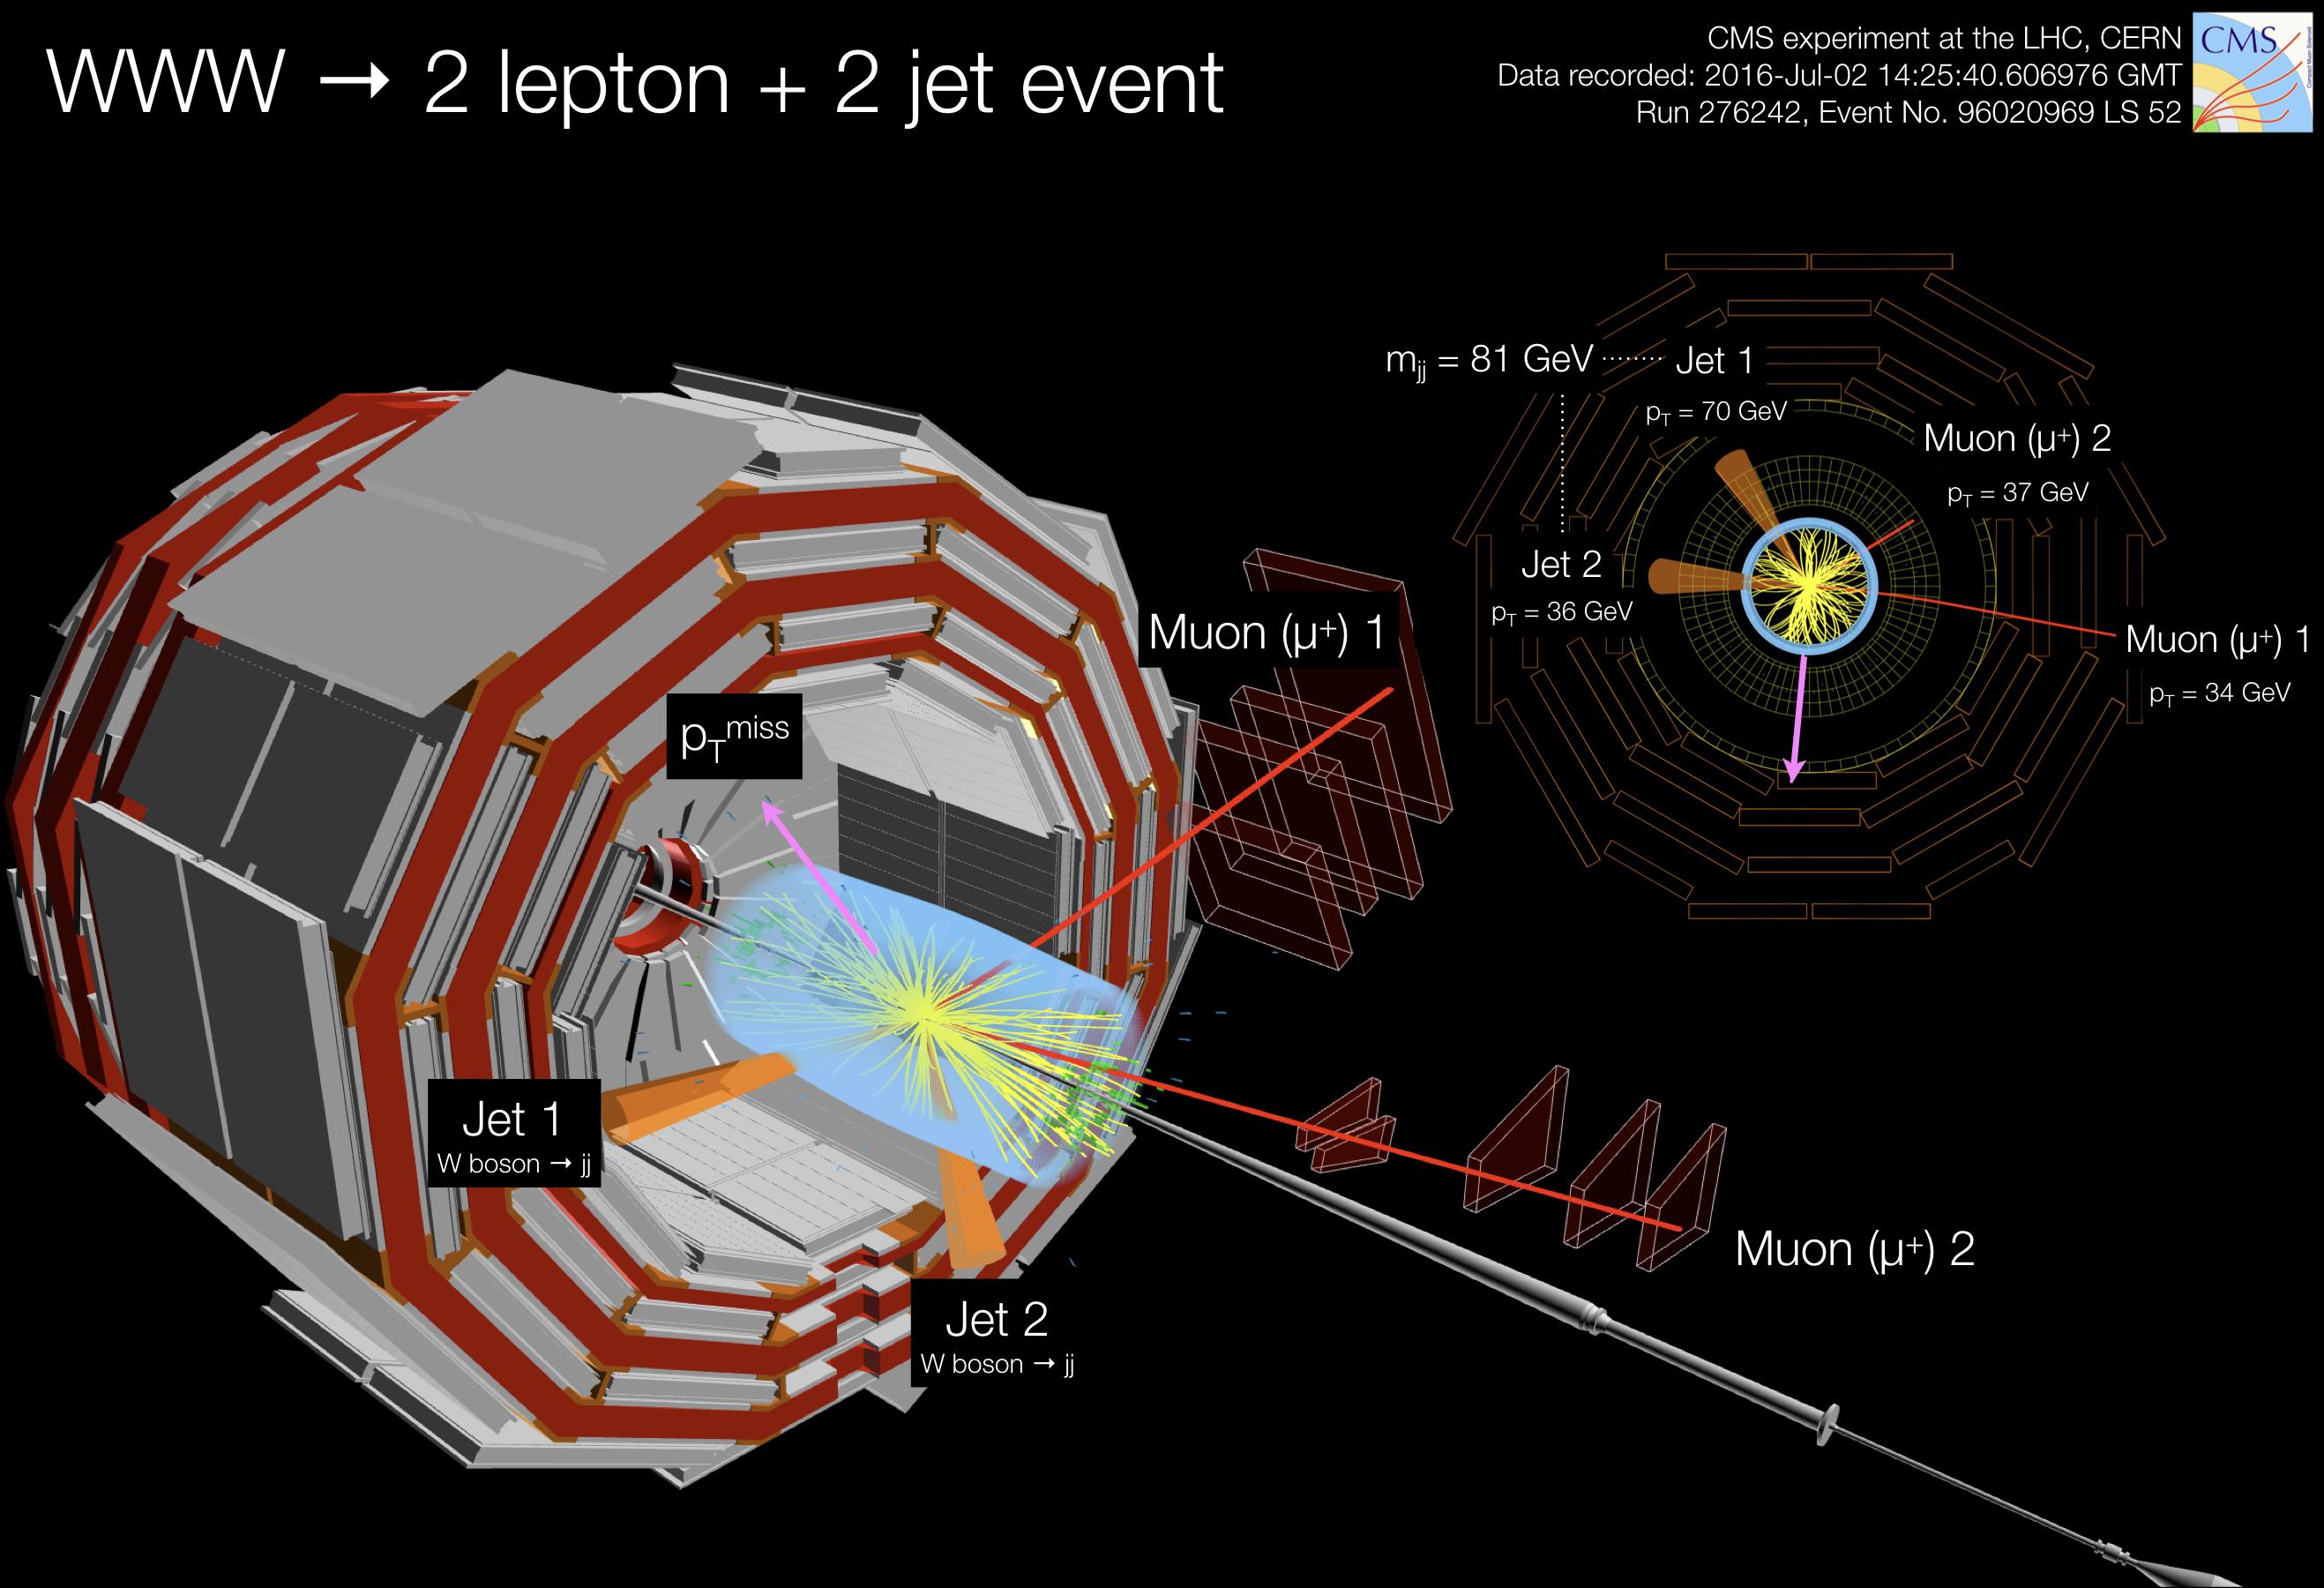 WWW -> 2 lepton + 2 jet event